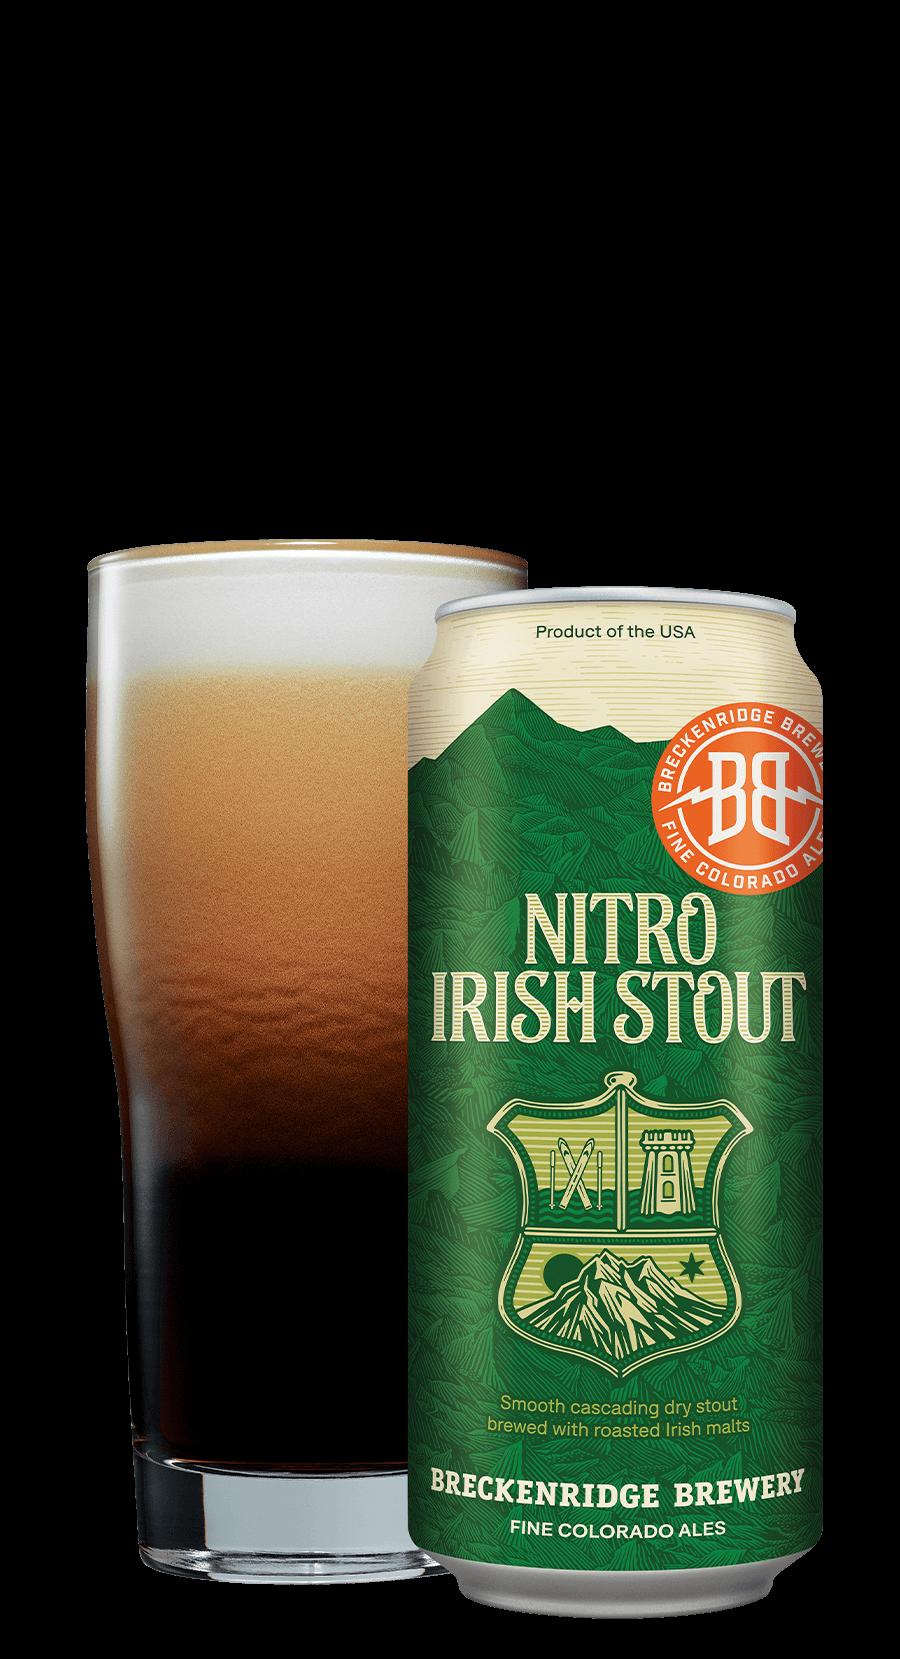 Nitro Irish Stout